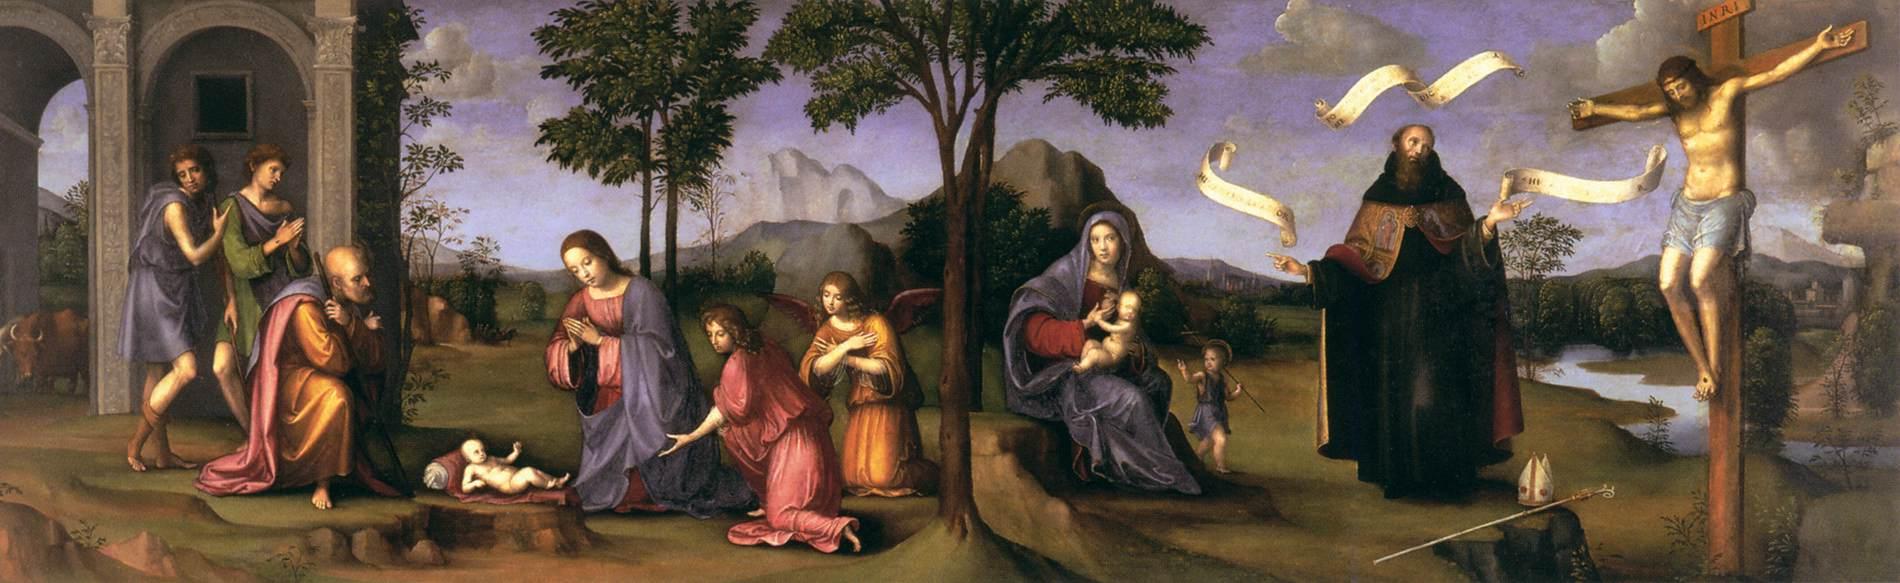 http://upload.wikimedia.org/wikipedia/commons/1/19/Francesco_Francia_-_Adoration_of_the_Child_-_WGA08171.jpg